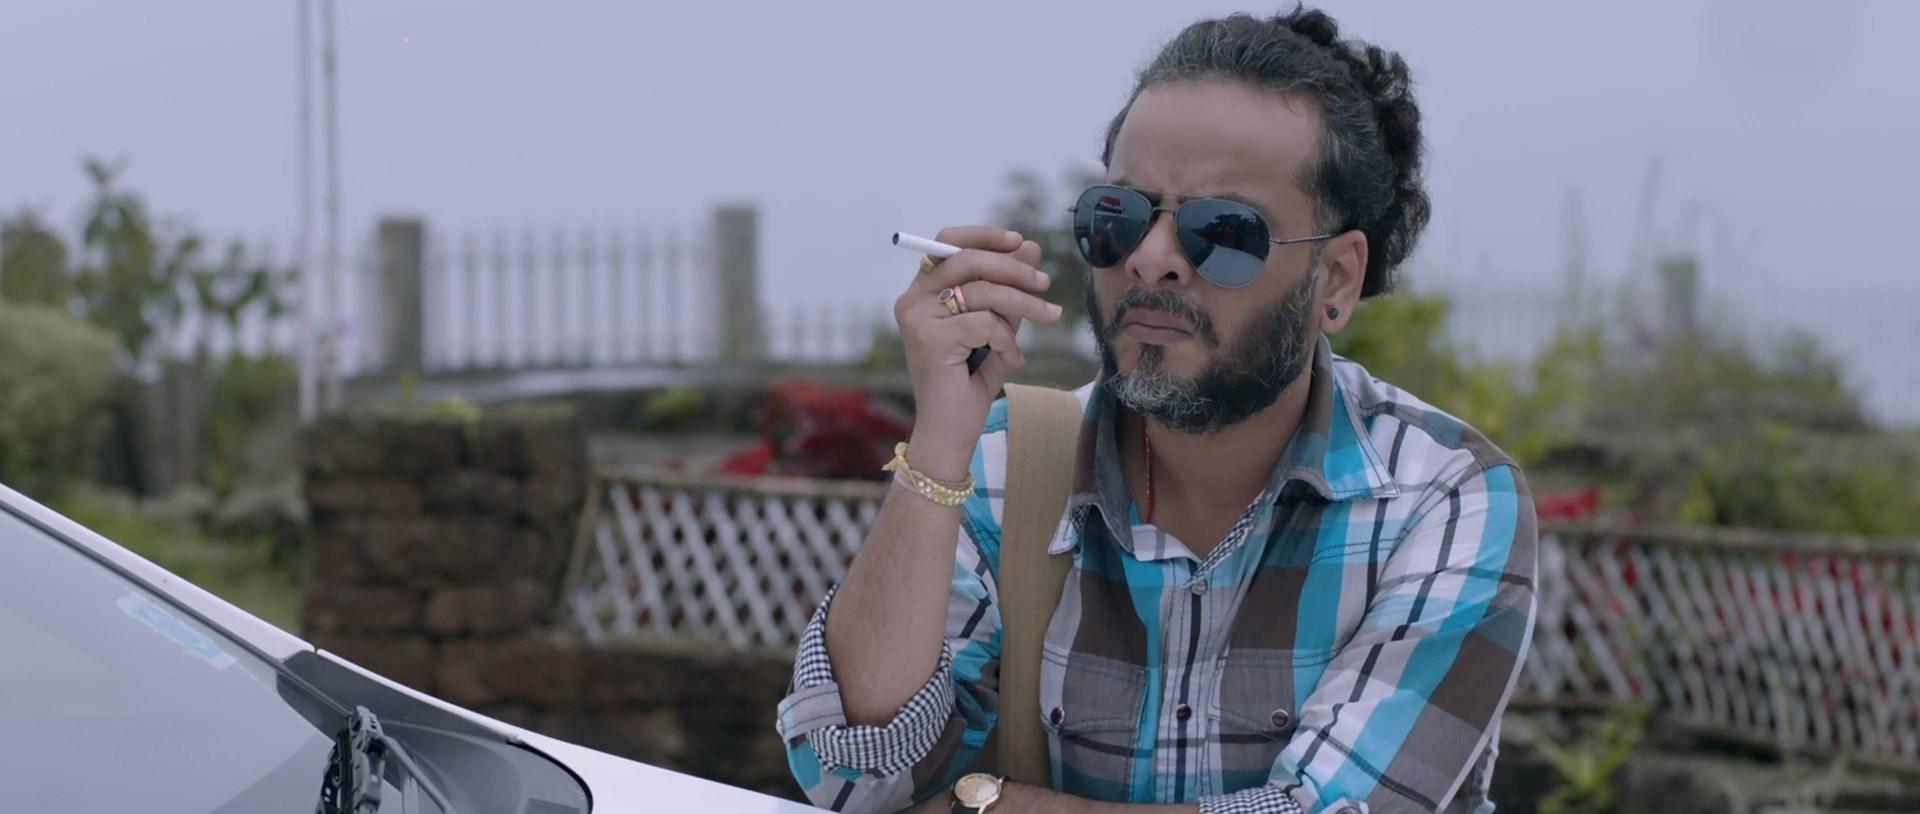 KAYA The Mystery Unfolds 2021 Bengali Movie 1080p WEB DL x264 AAC.mp4 snapshot 00.39.20.250